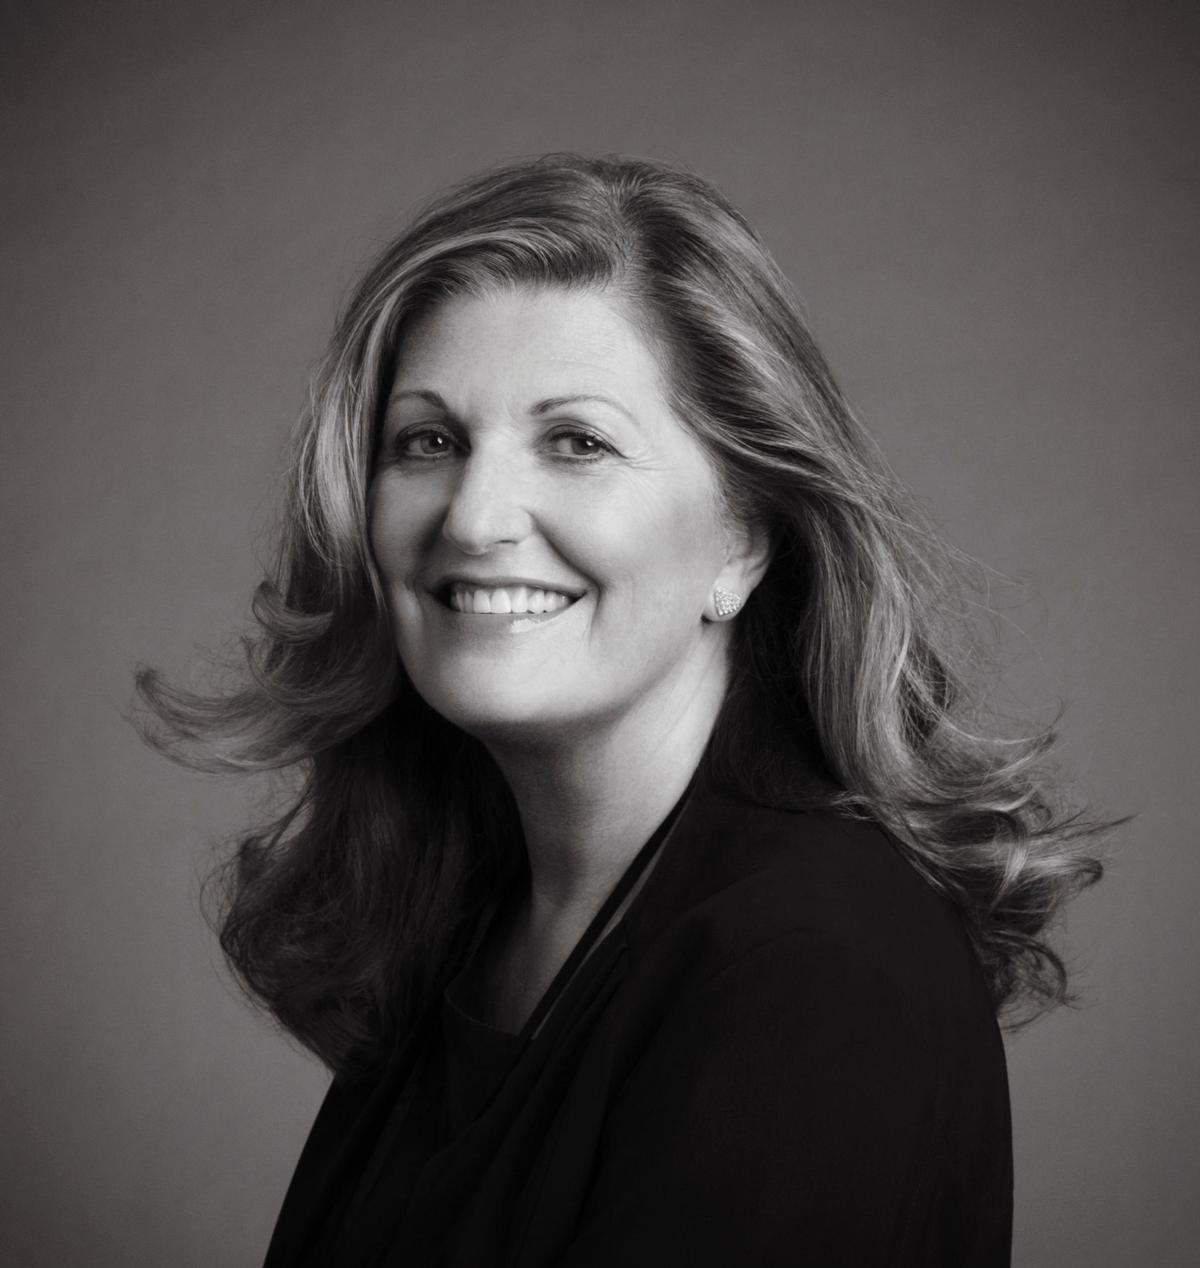 Sue Harmsworth gave a masterclass for the Global Wellness Summit webinar series / ESPA